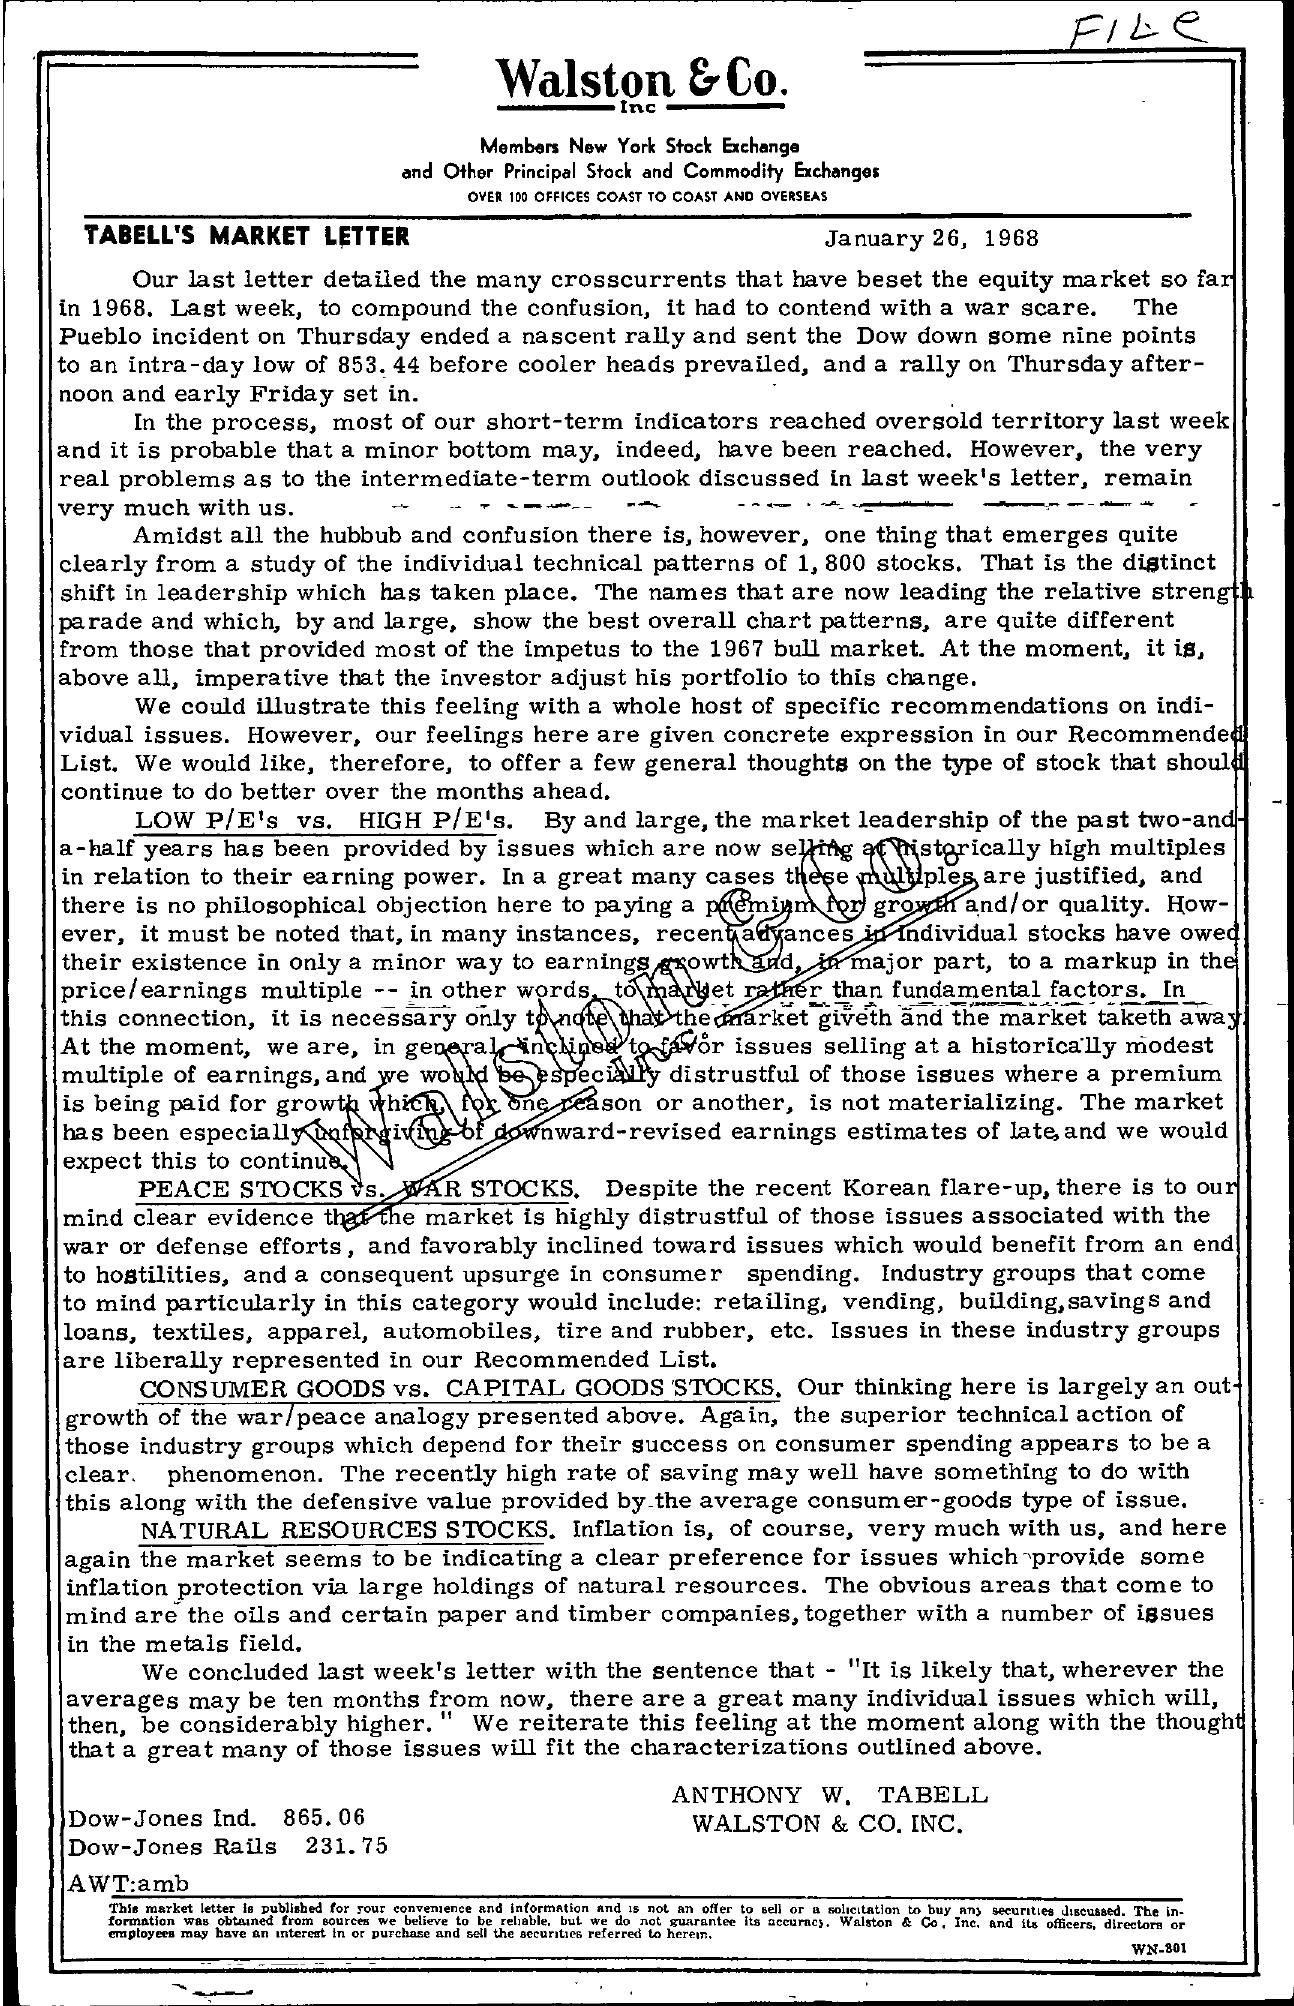 Tabell's Market Letter - January 26, 1968